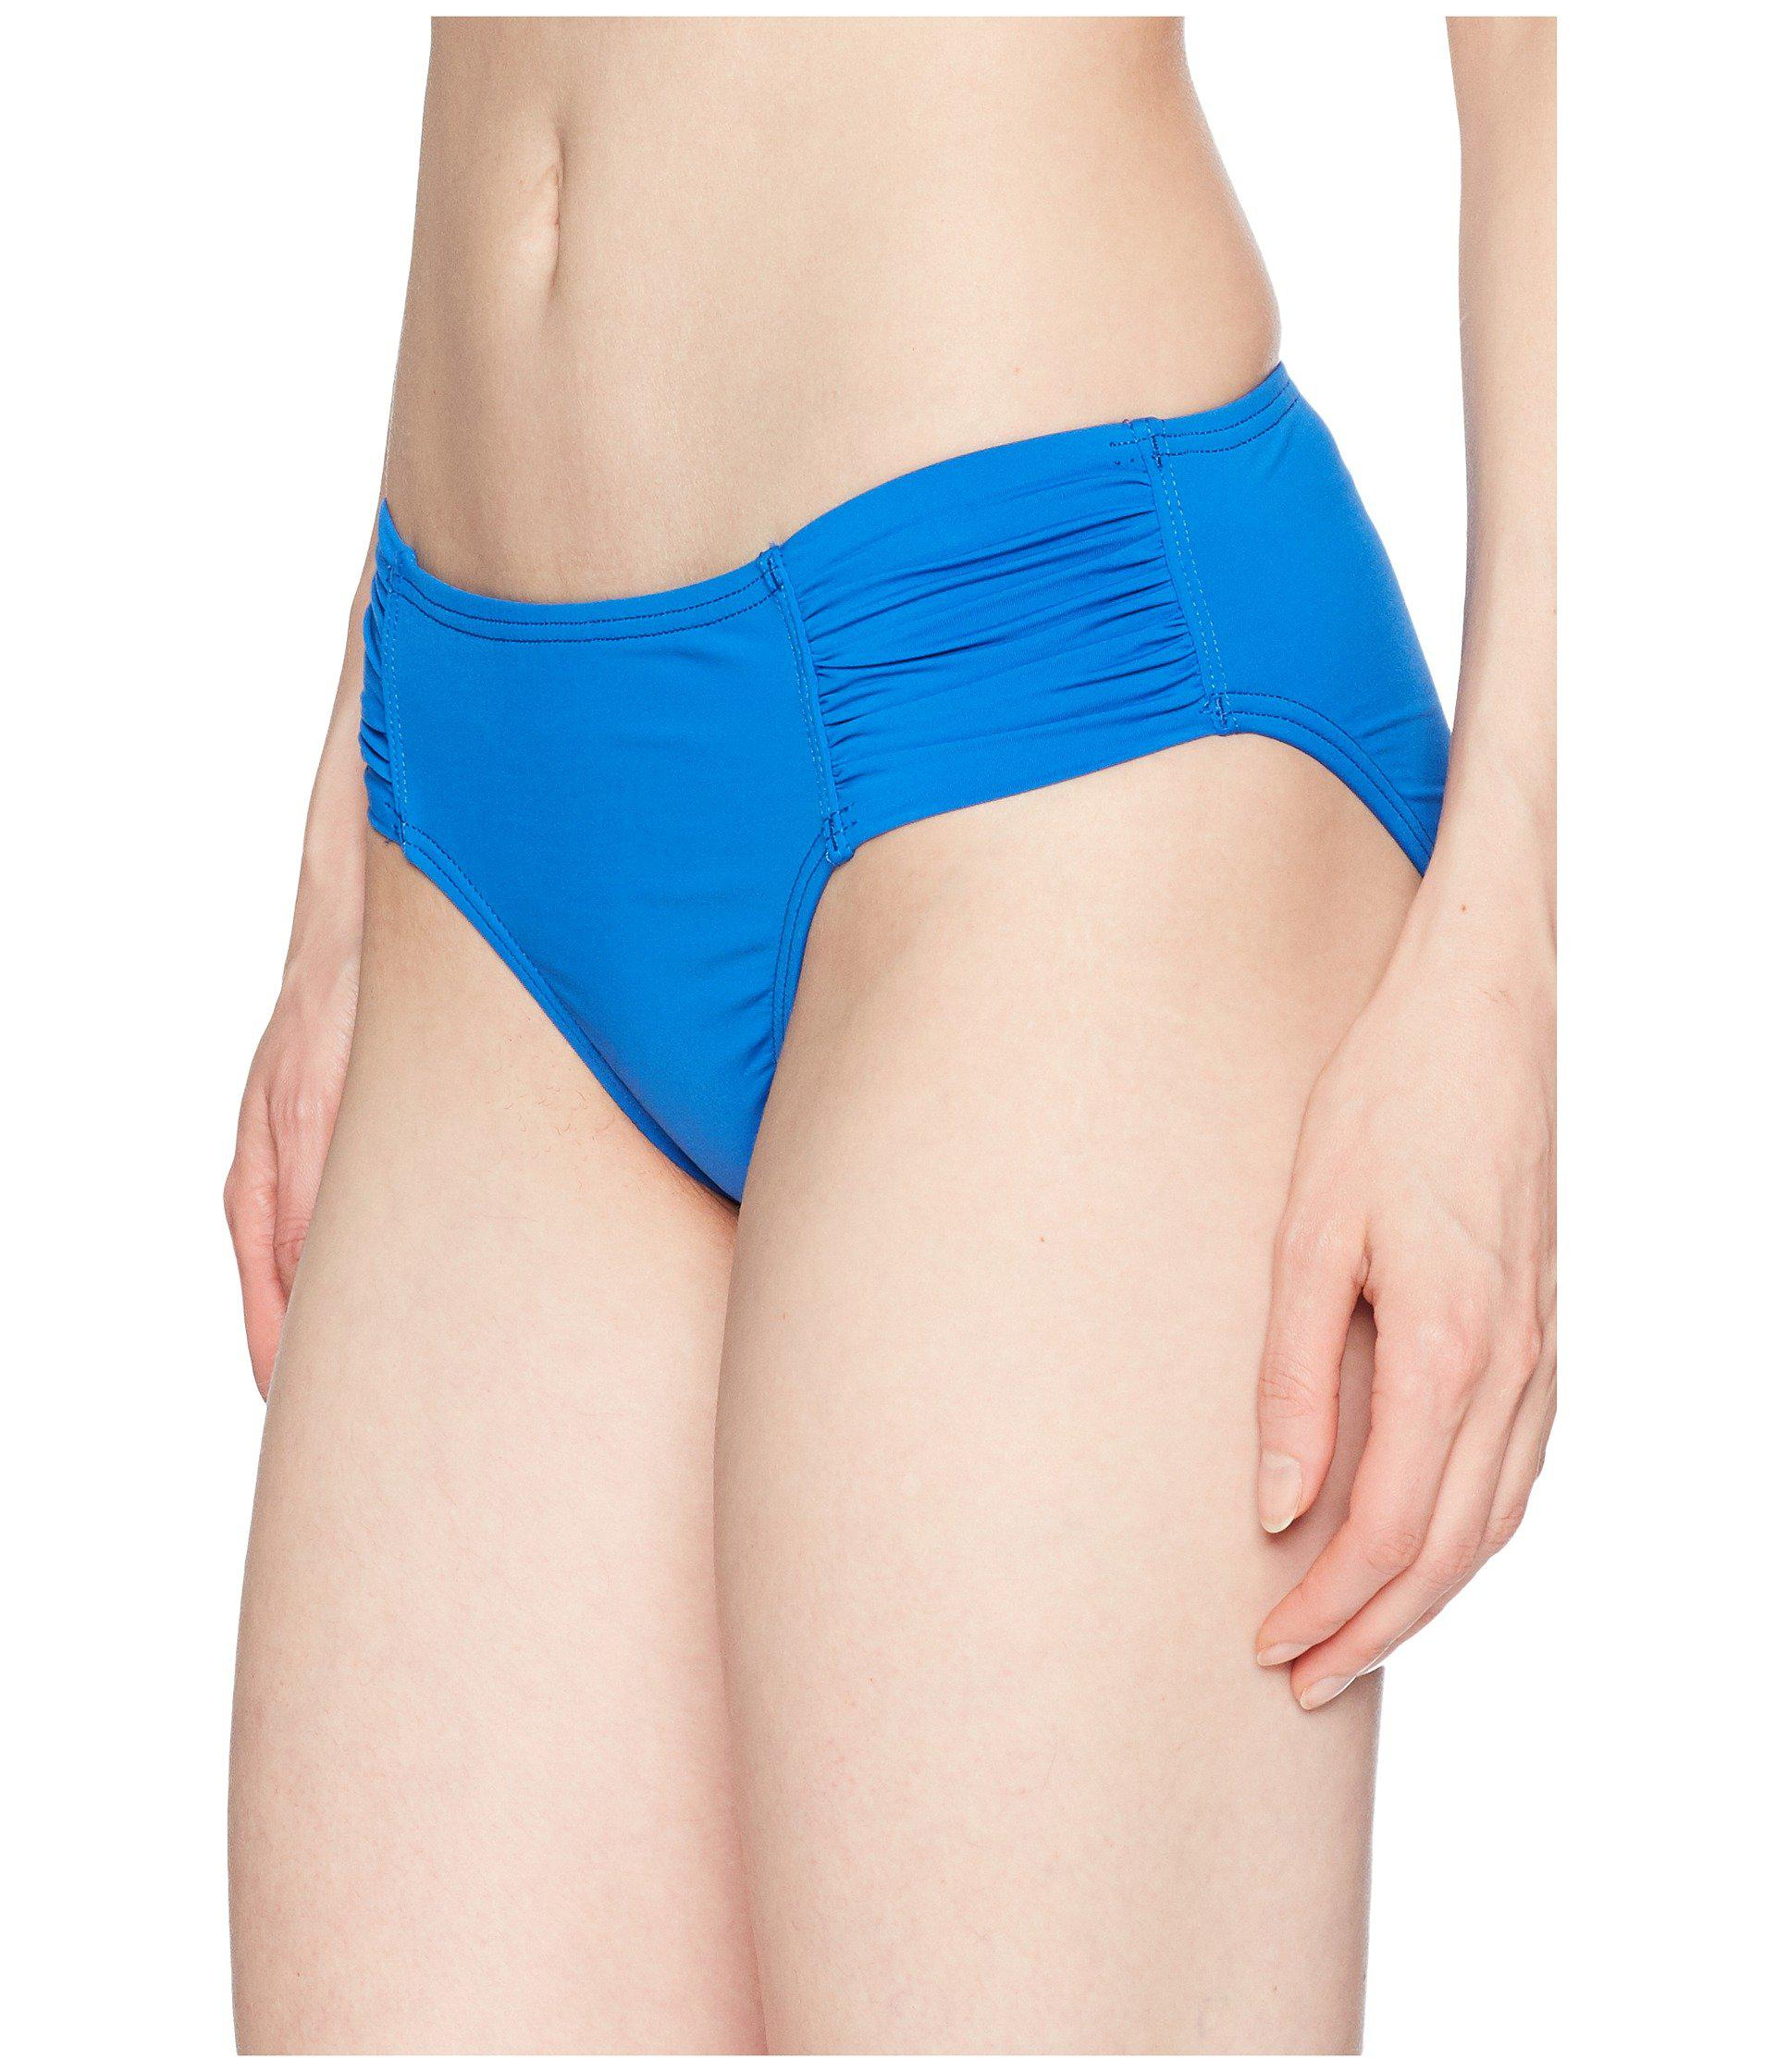 ebf21f63a0d1e Lyst - Tommy Bahama Pearl High-waist Side-shirred Bikini Bottom in Blue -  Save 66%